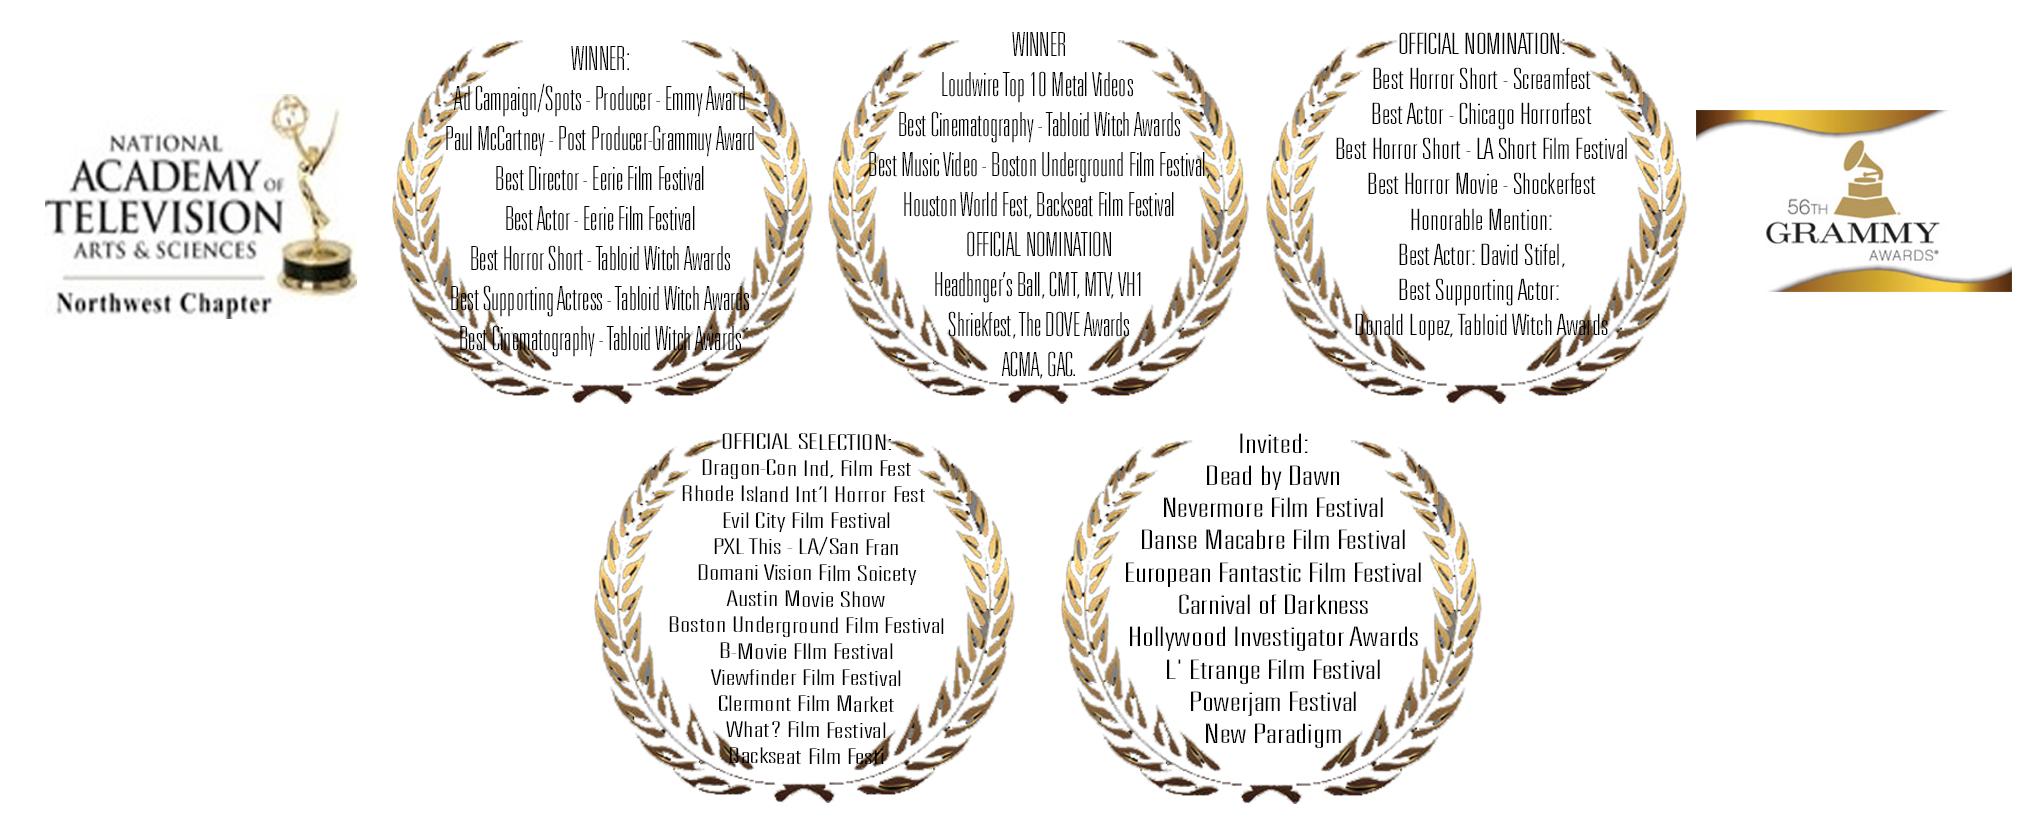 Robert Sexton: Director and Emmy Award Winning Producer.